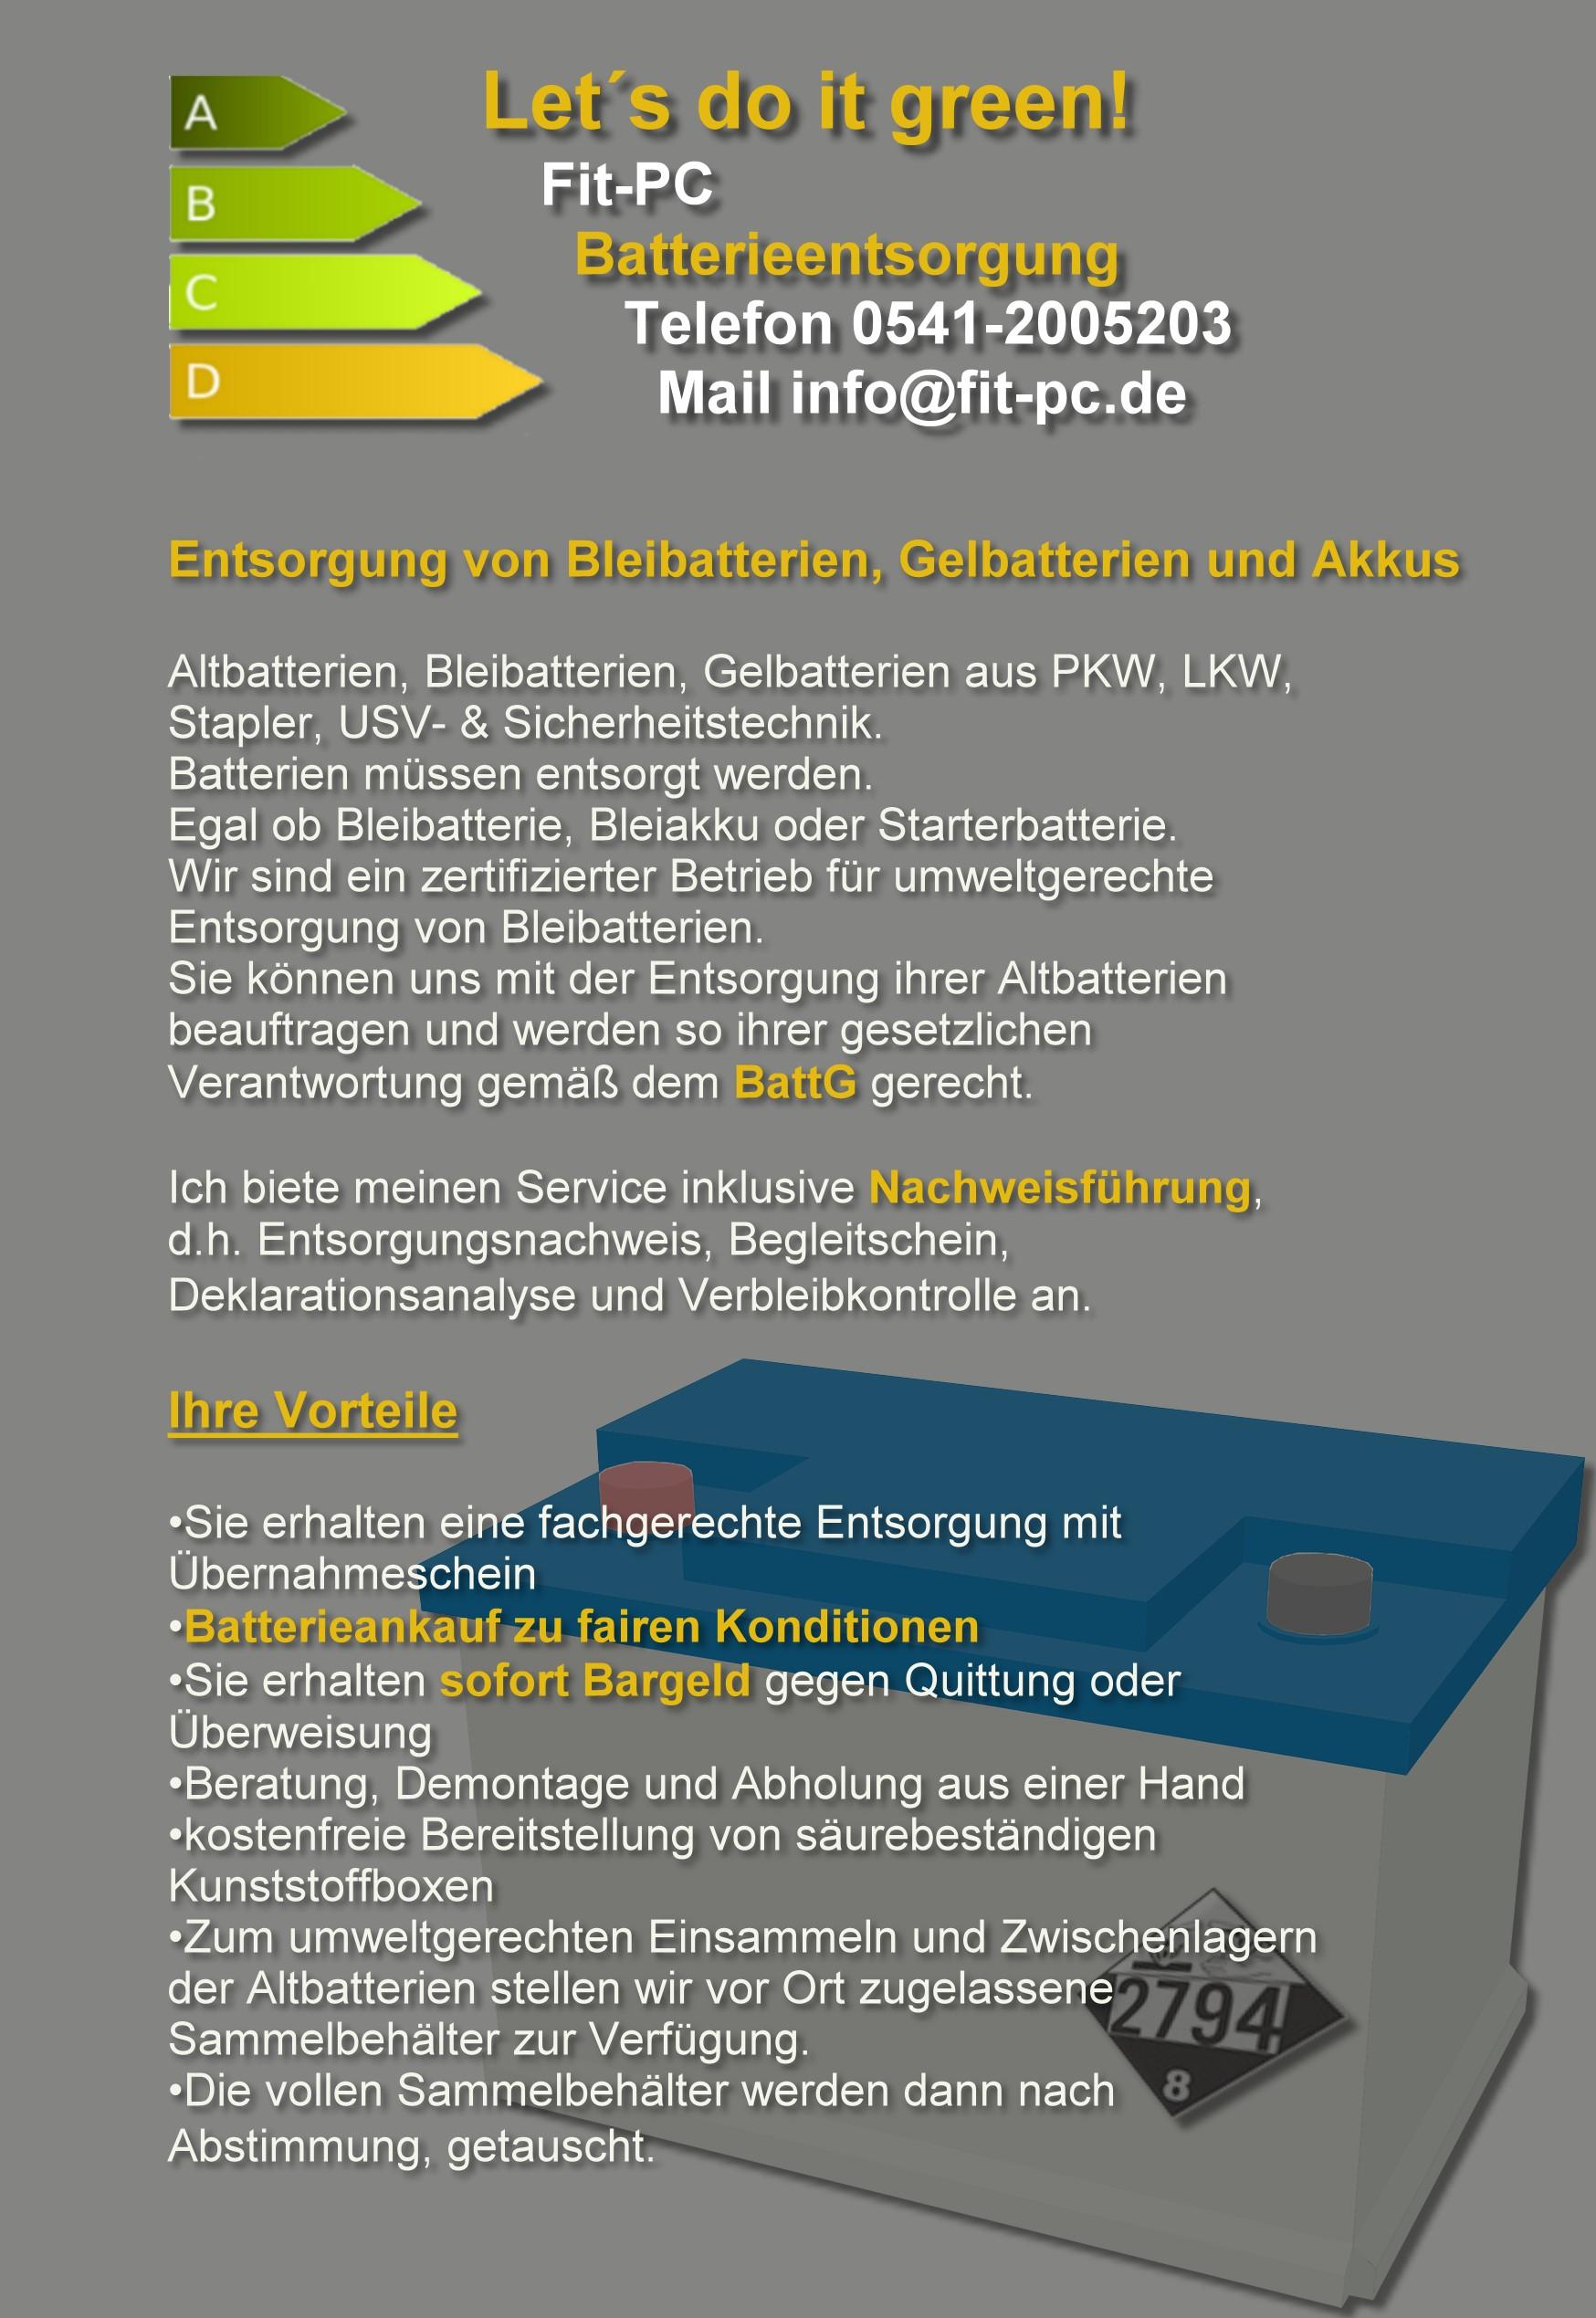 Gemütlich 15 Zoll Drahtkappen Fotos - Schaltplan Serie Circuit ...